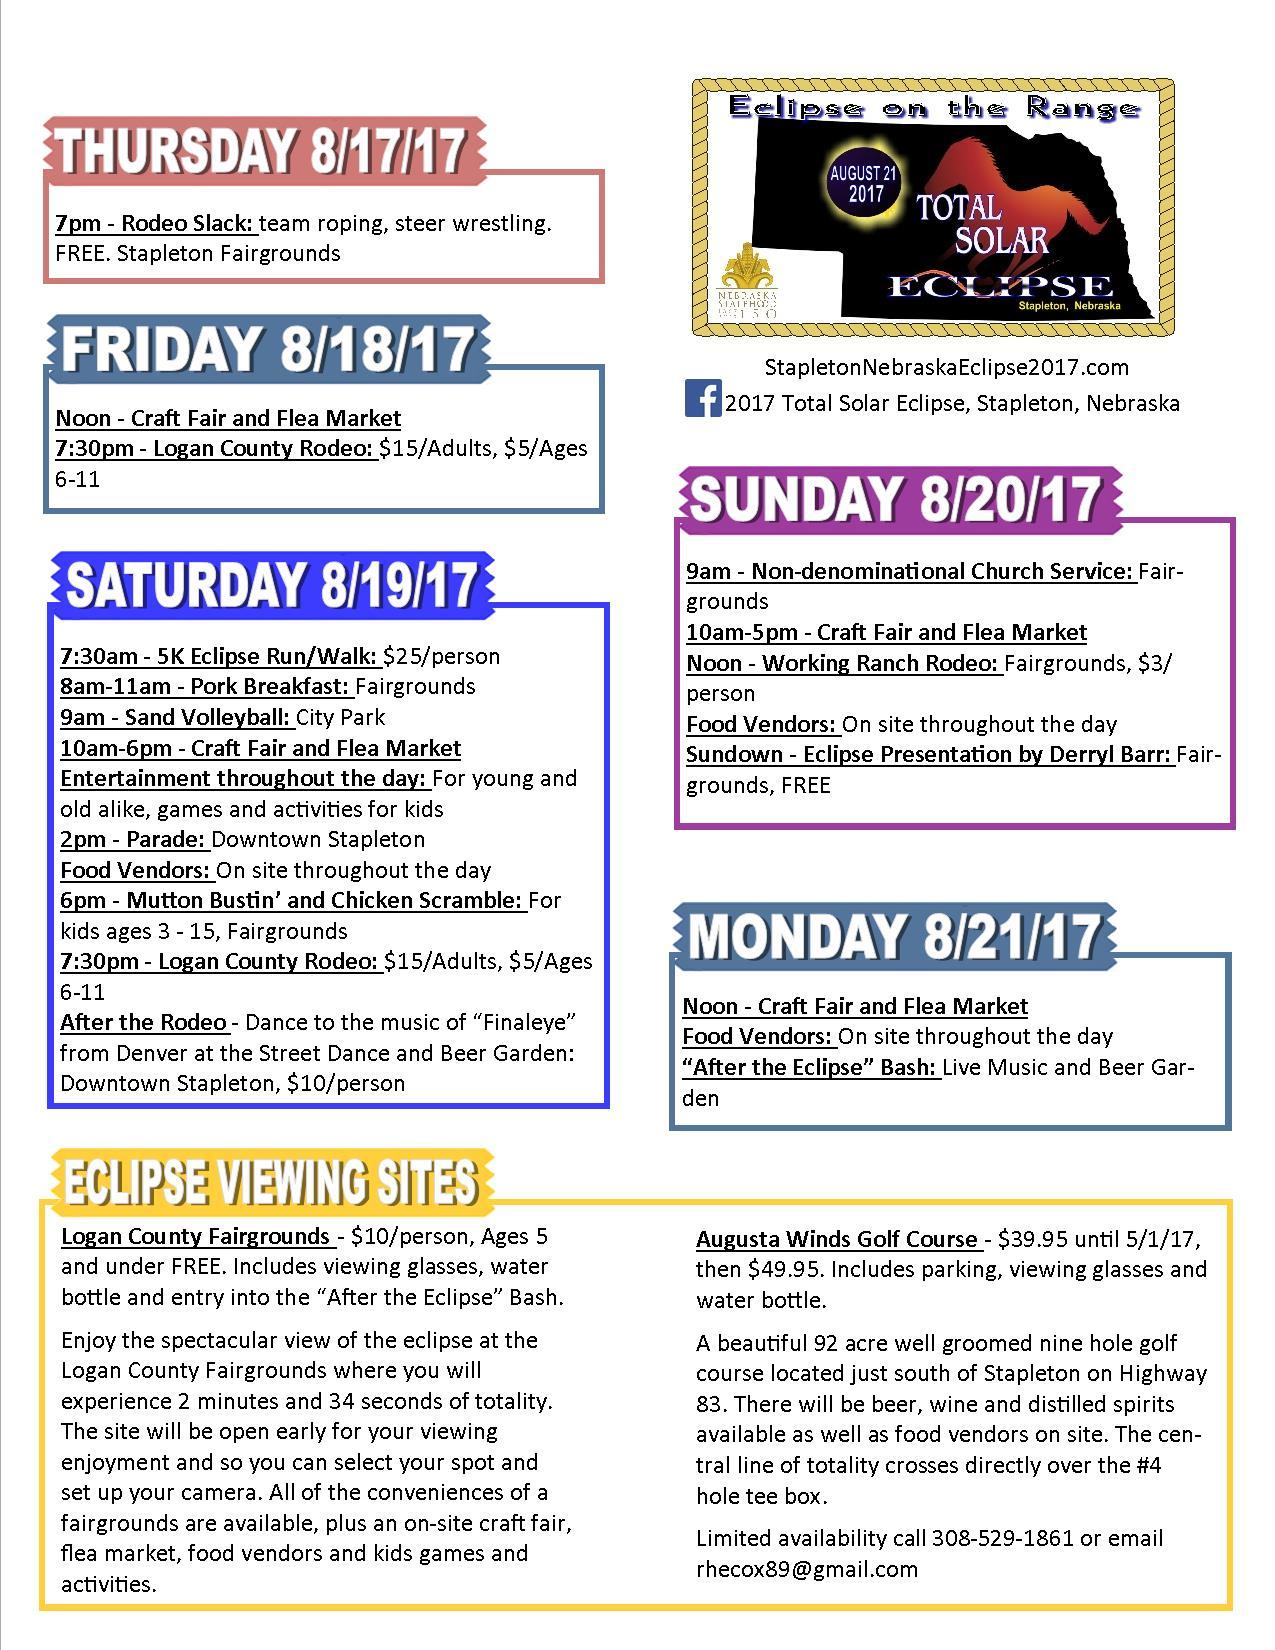 Stapleton Eclipse Schedule of Events